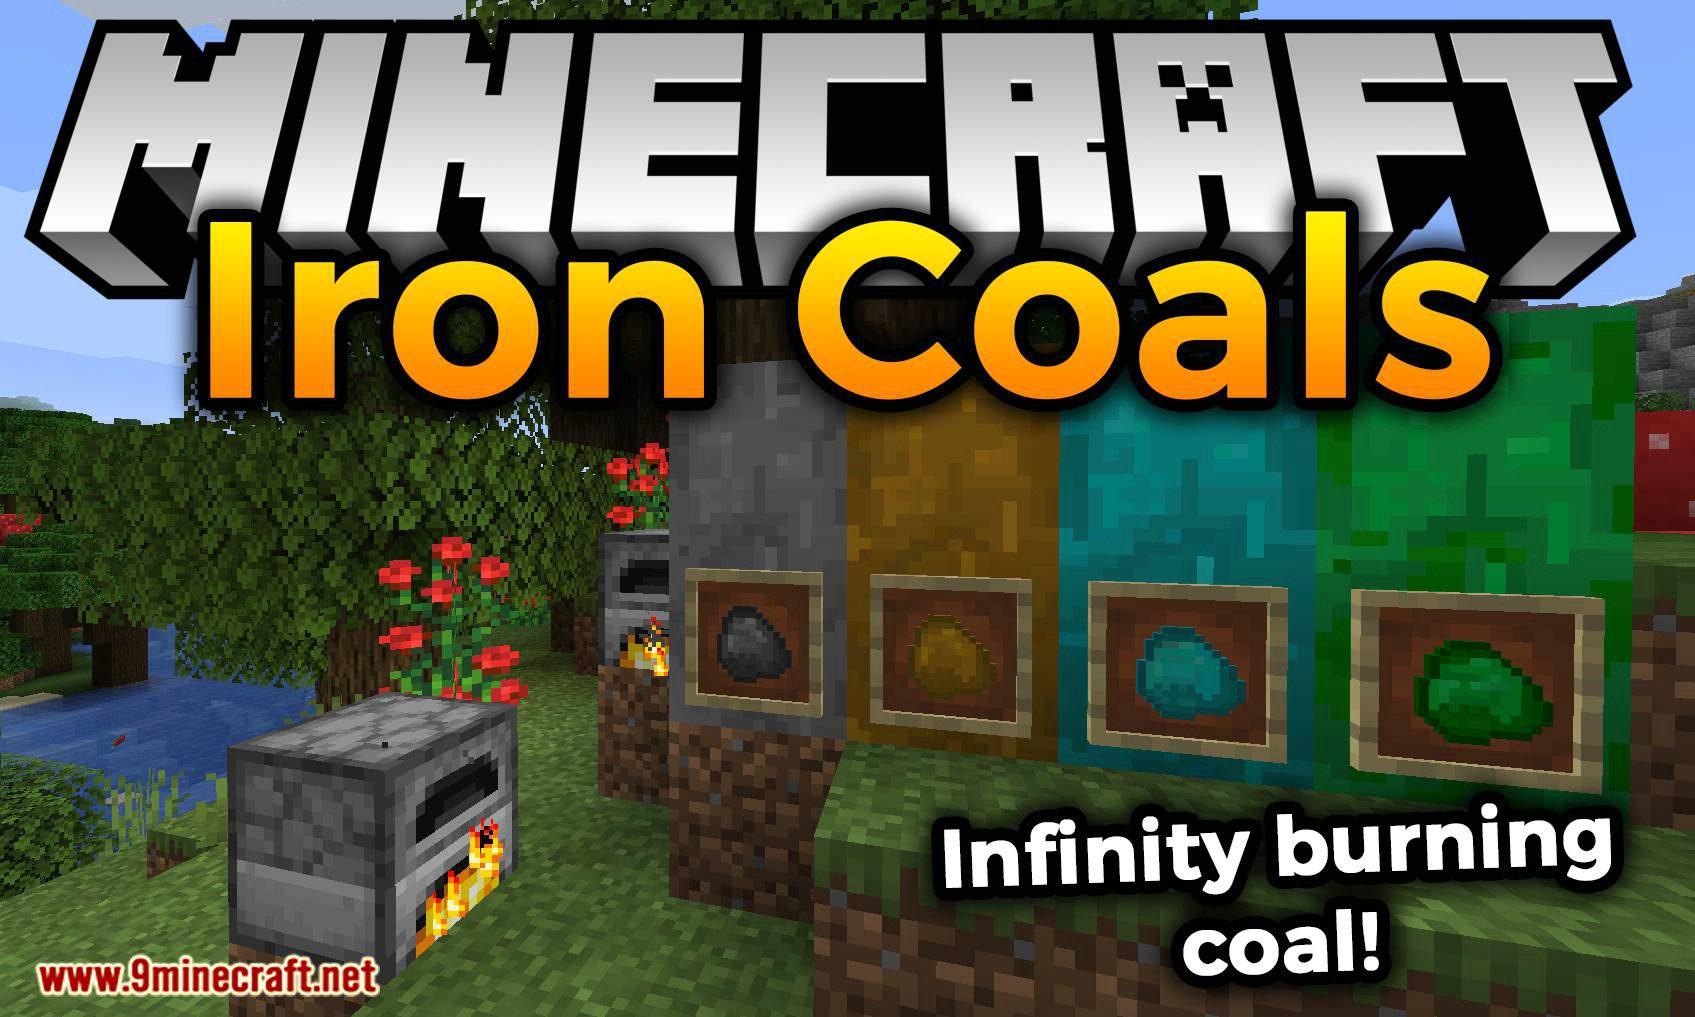 Iron Coals mod for minecraft logo